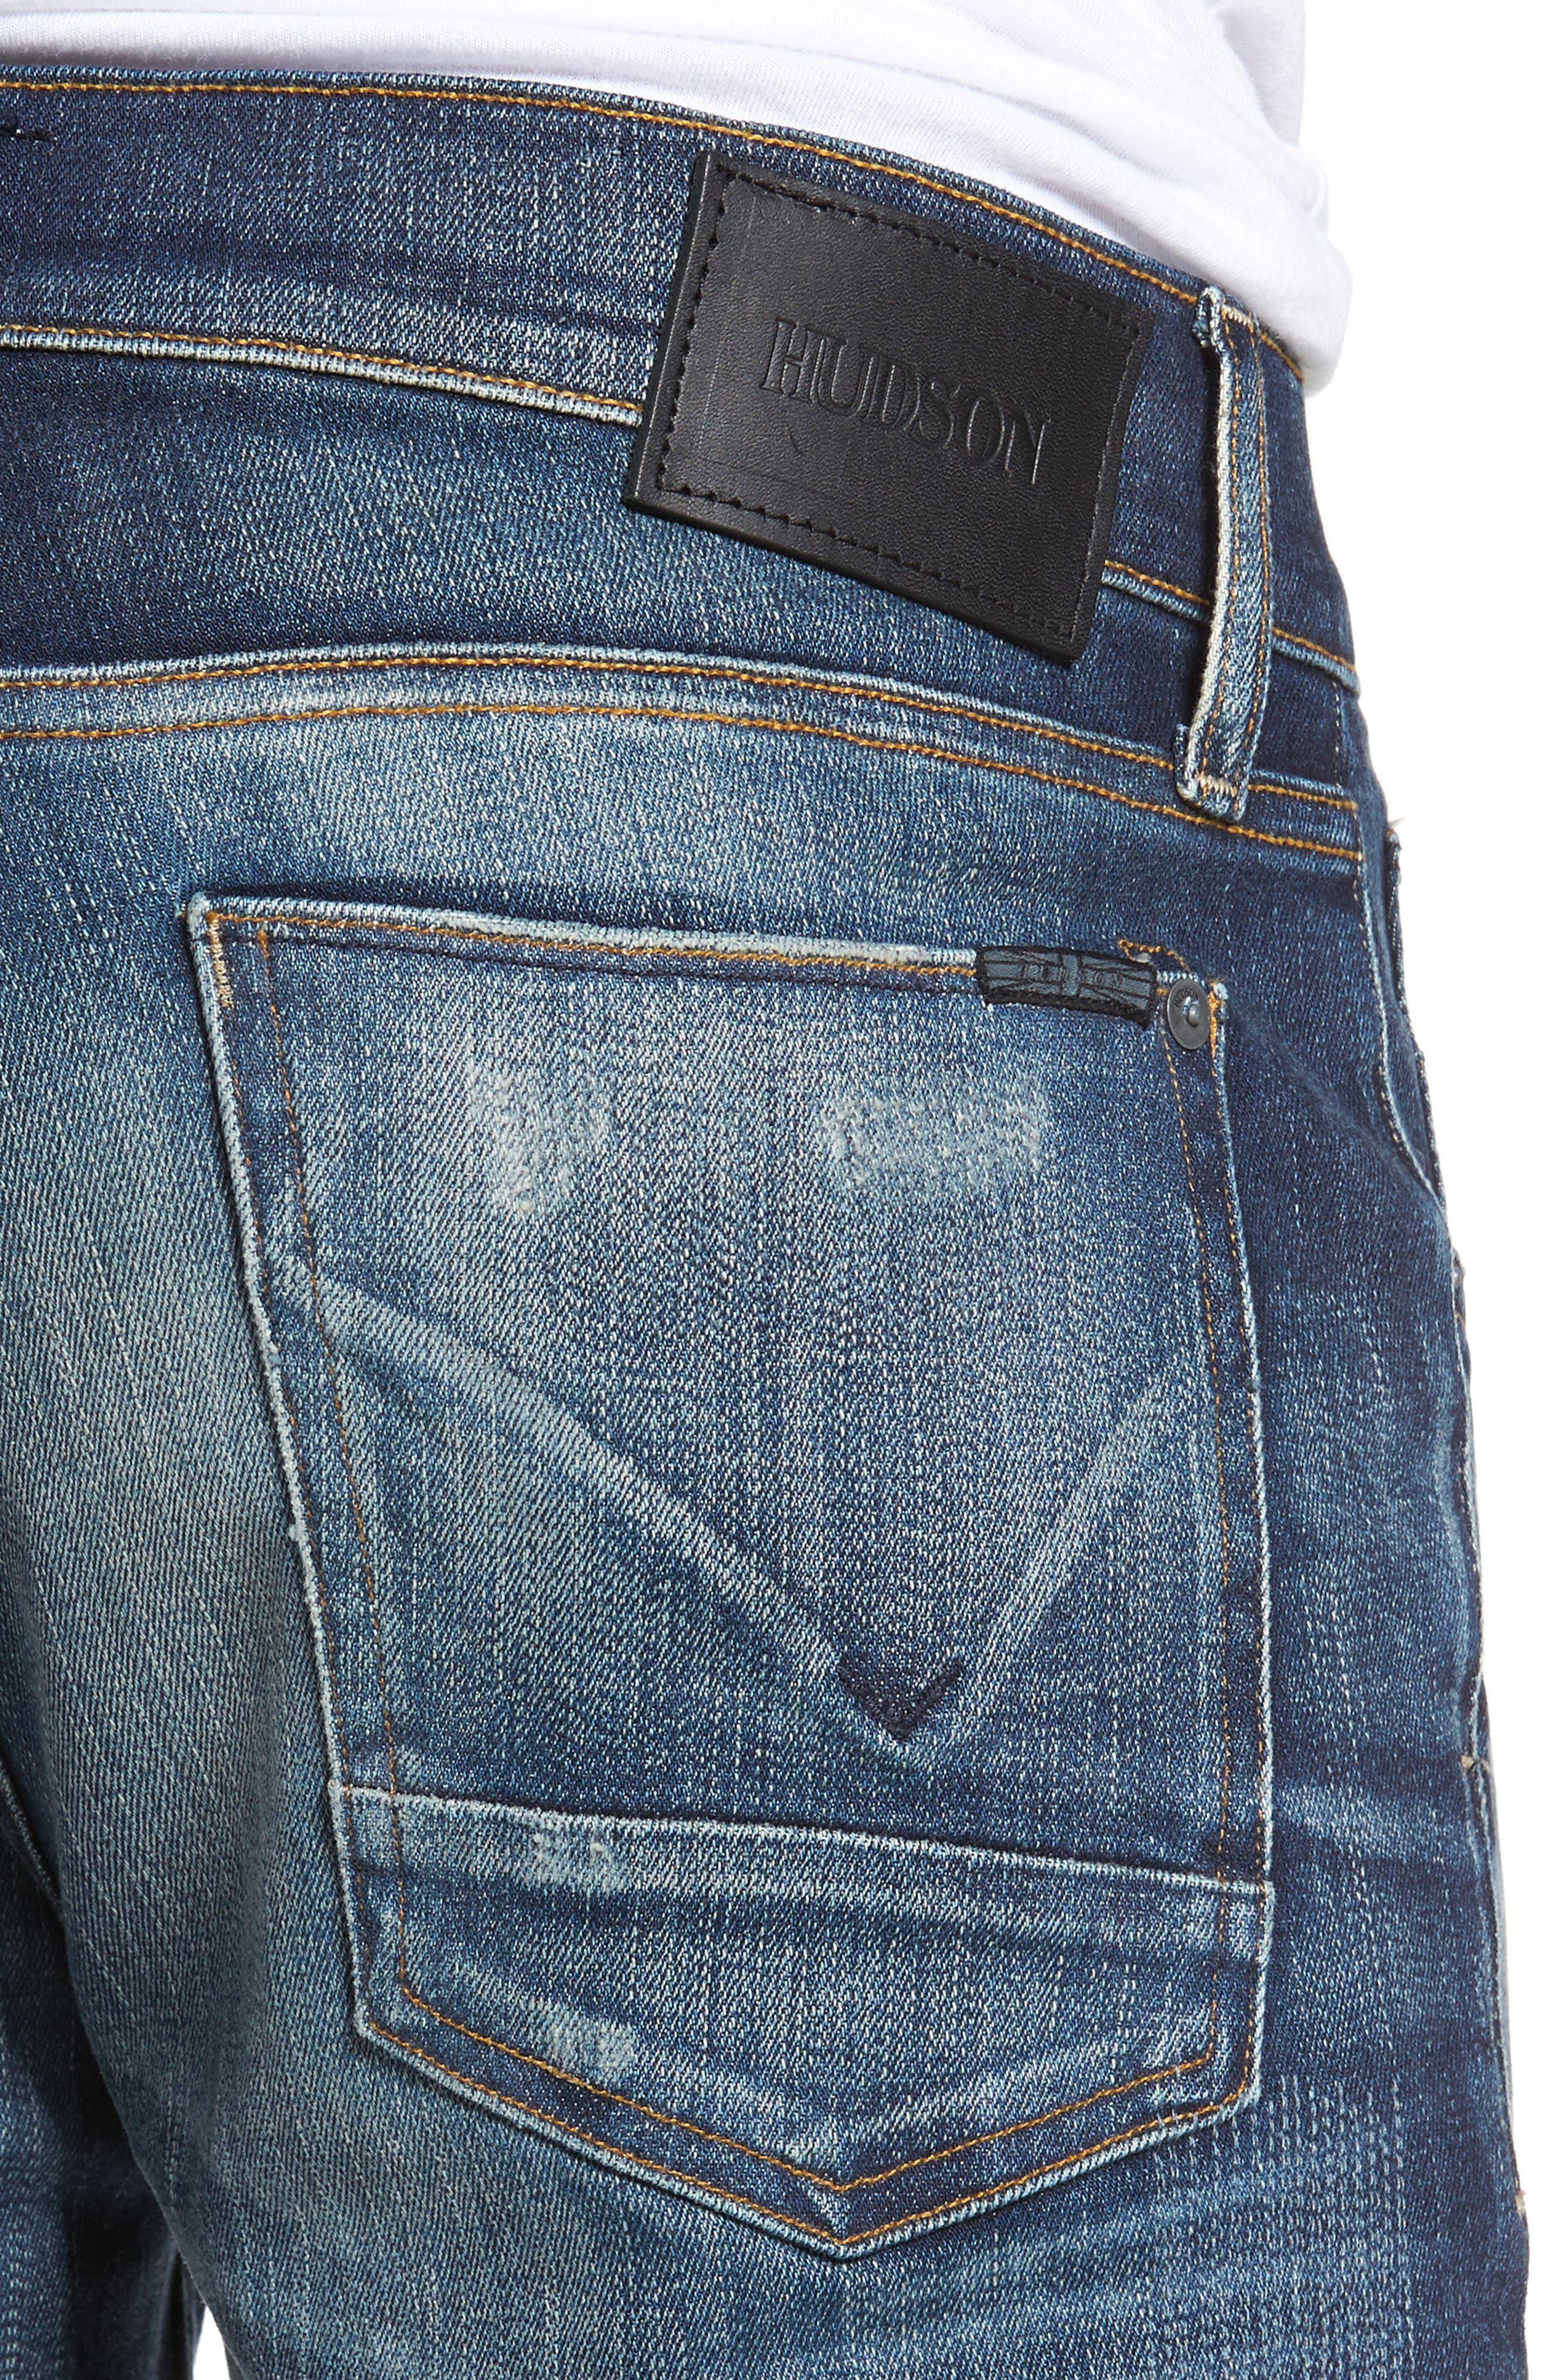 Hudson Blake Slim Fit Jeans,                             Alternate thumbnail 4, color,                             420